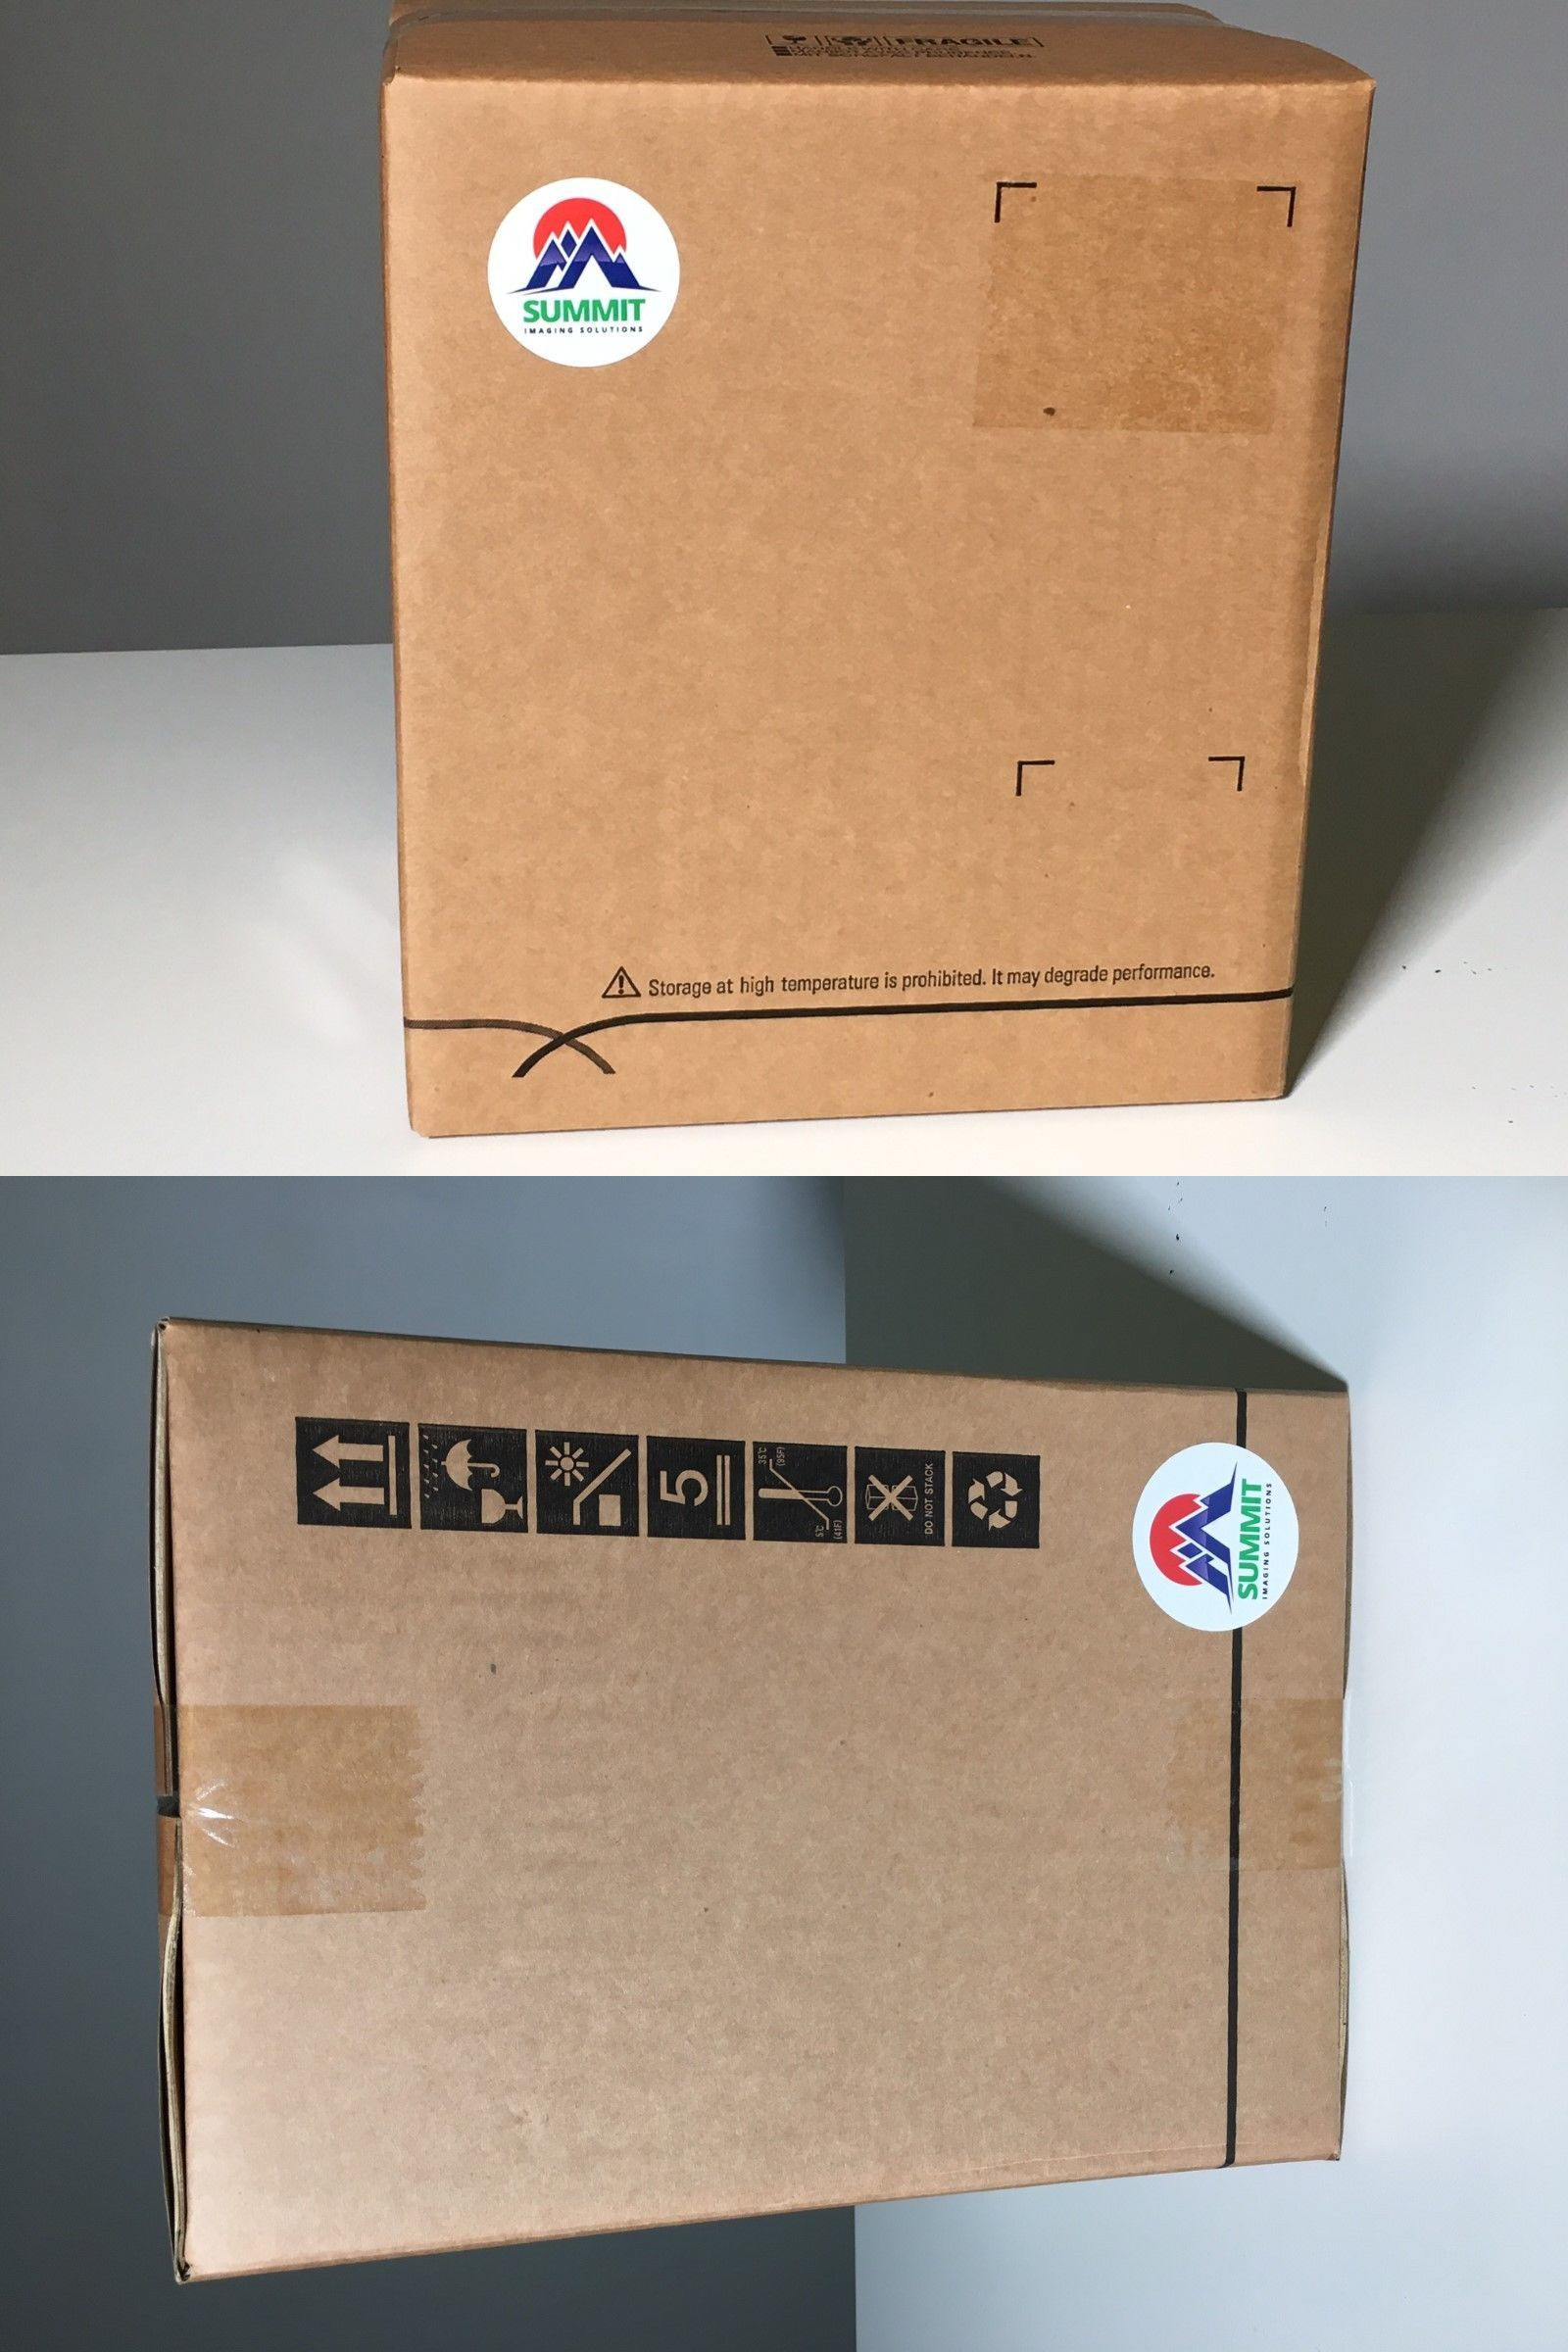 DCBP-S1245 Summit S1245 8x10x280 Print Pack for shinko 1245 printer